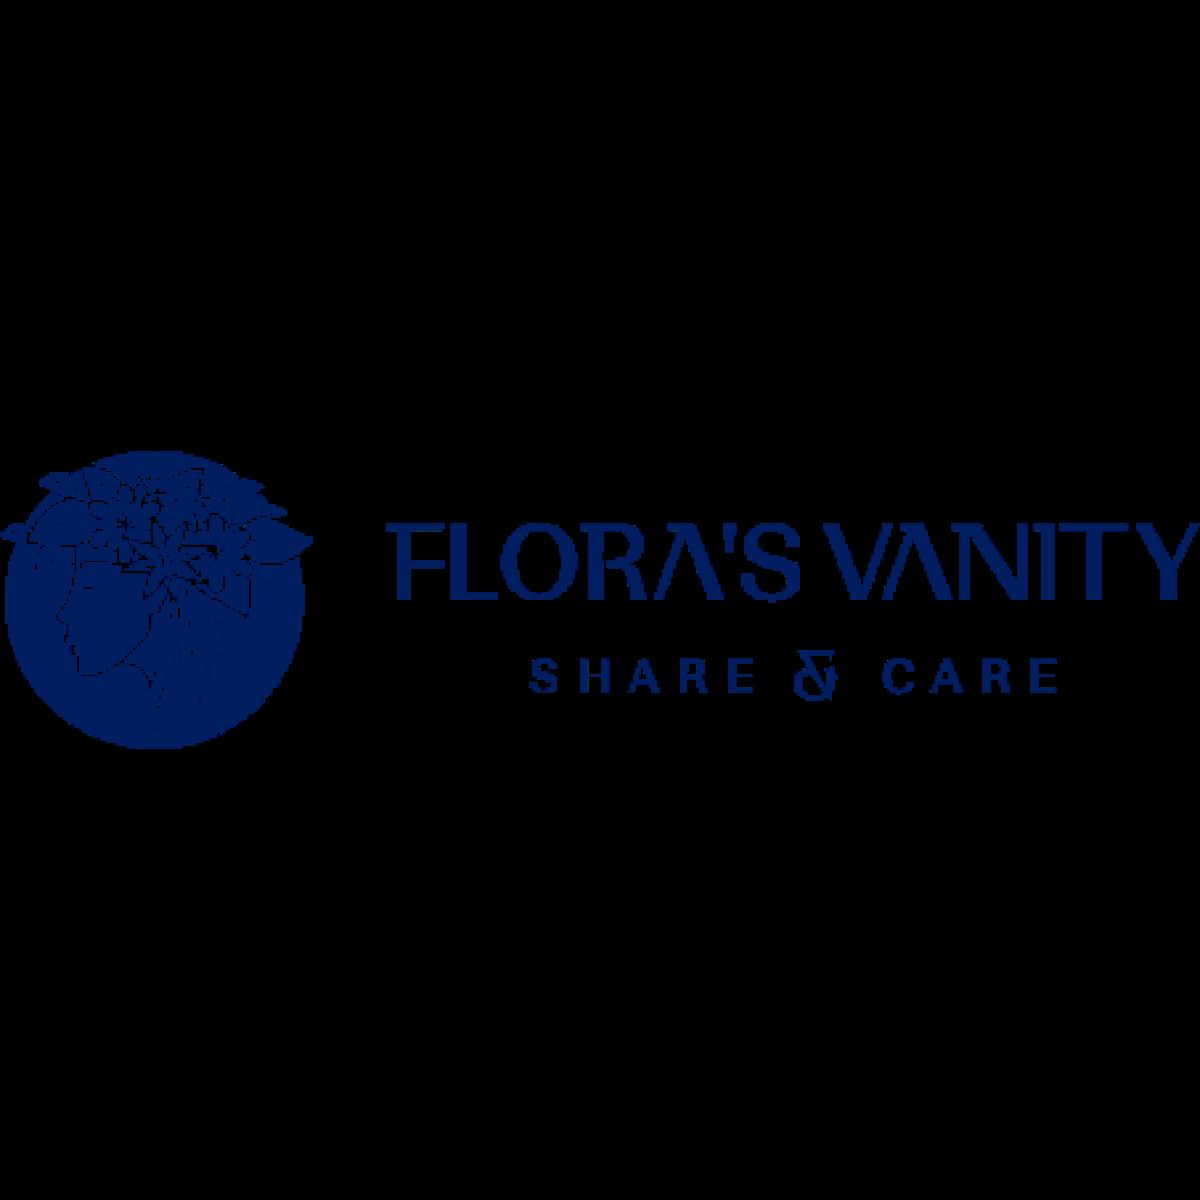 Flora-vanity